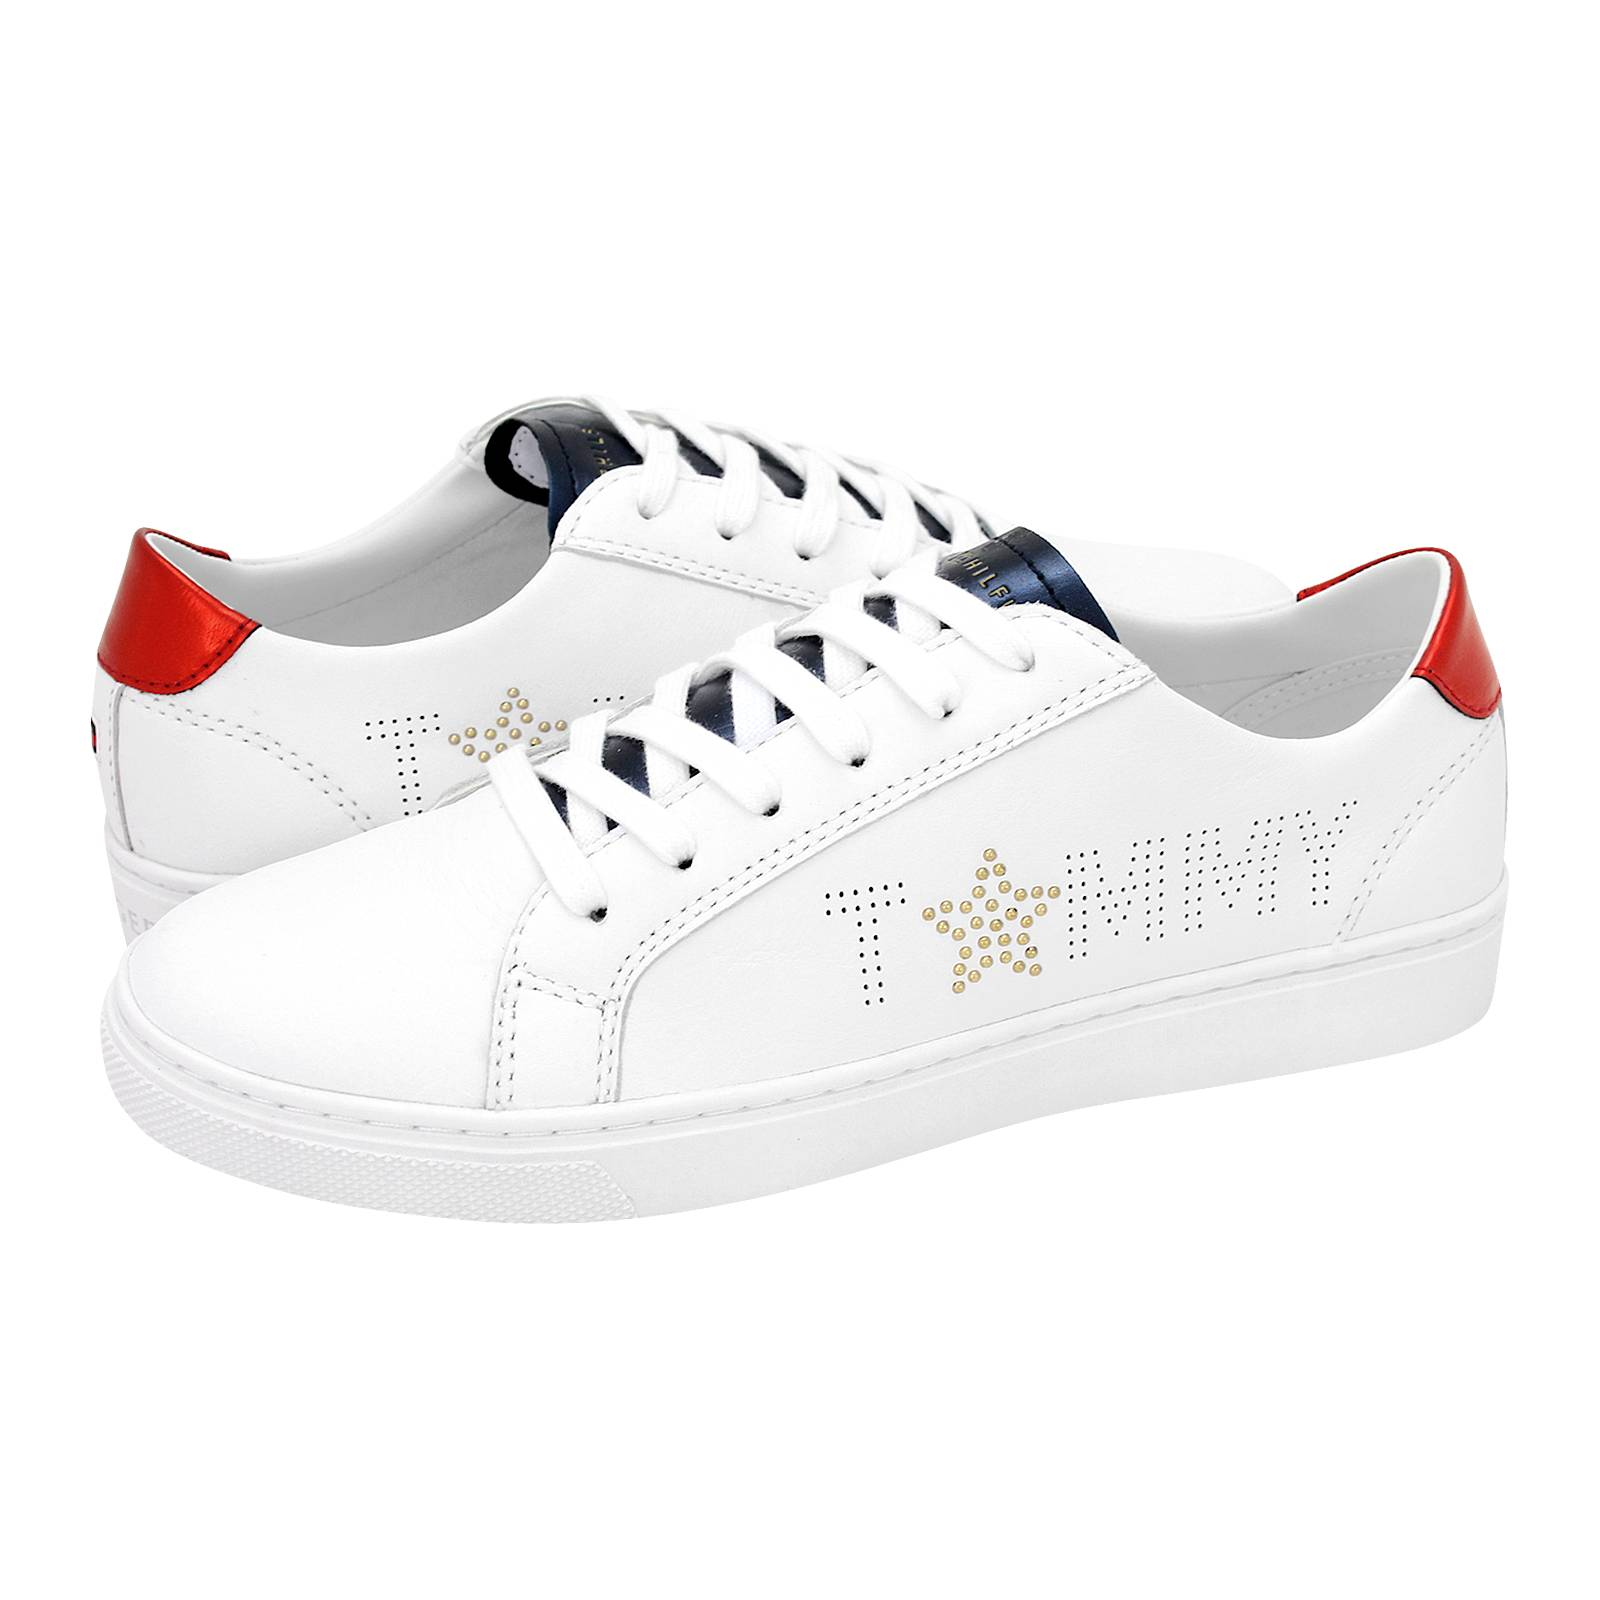 7031a7394e3 Star Metallic Sneaker - Γυναικεία παπούτσια casual Tommy Hilfiger ...